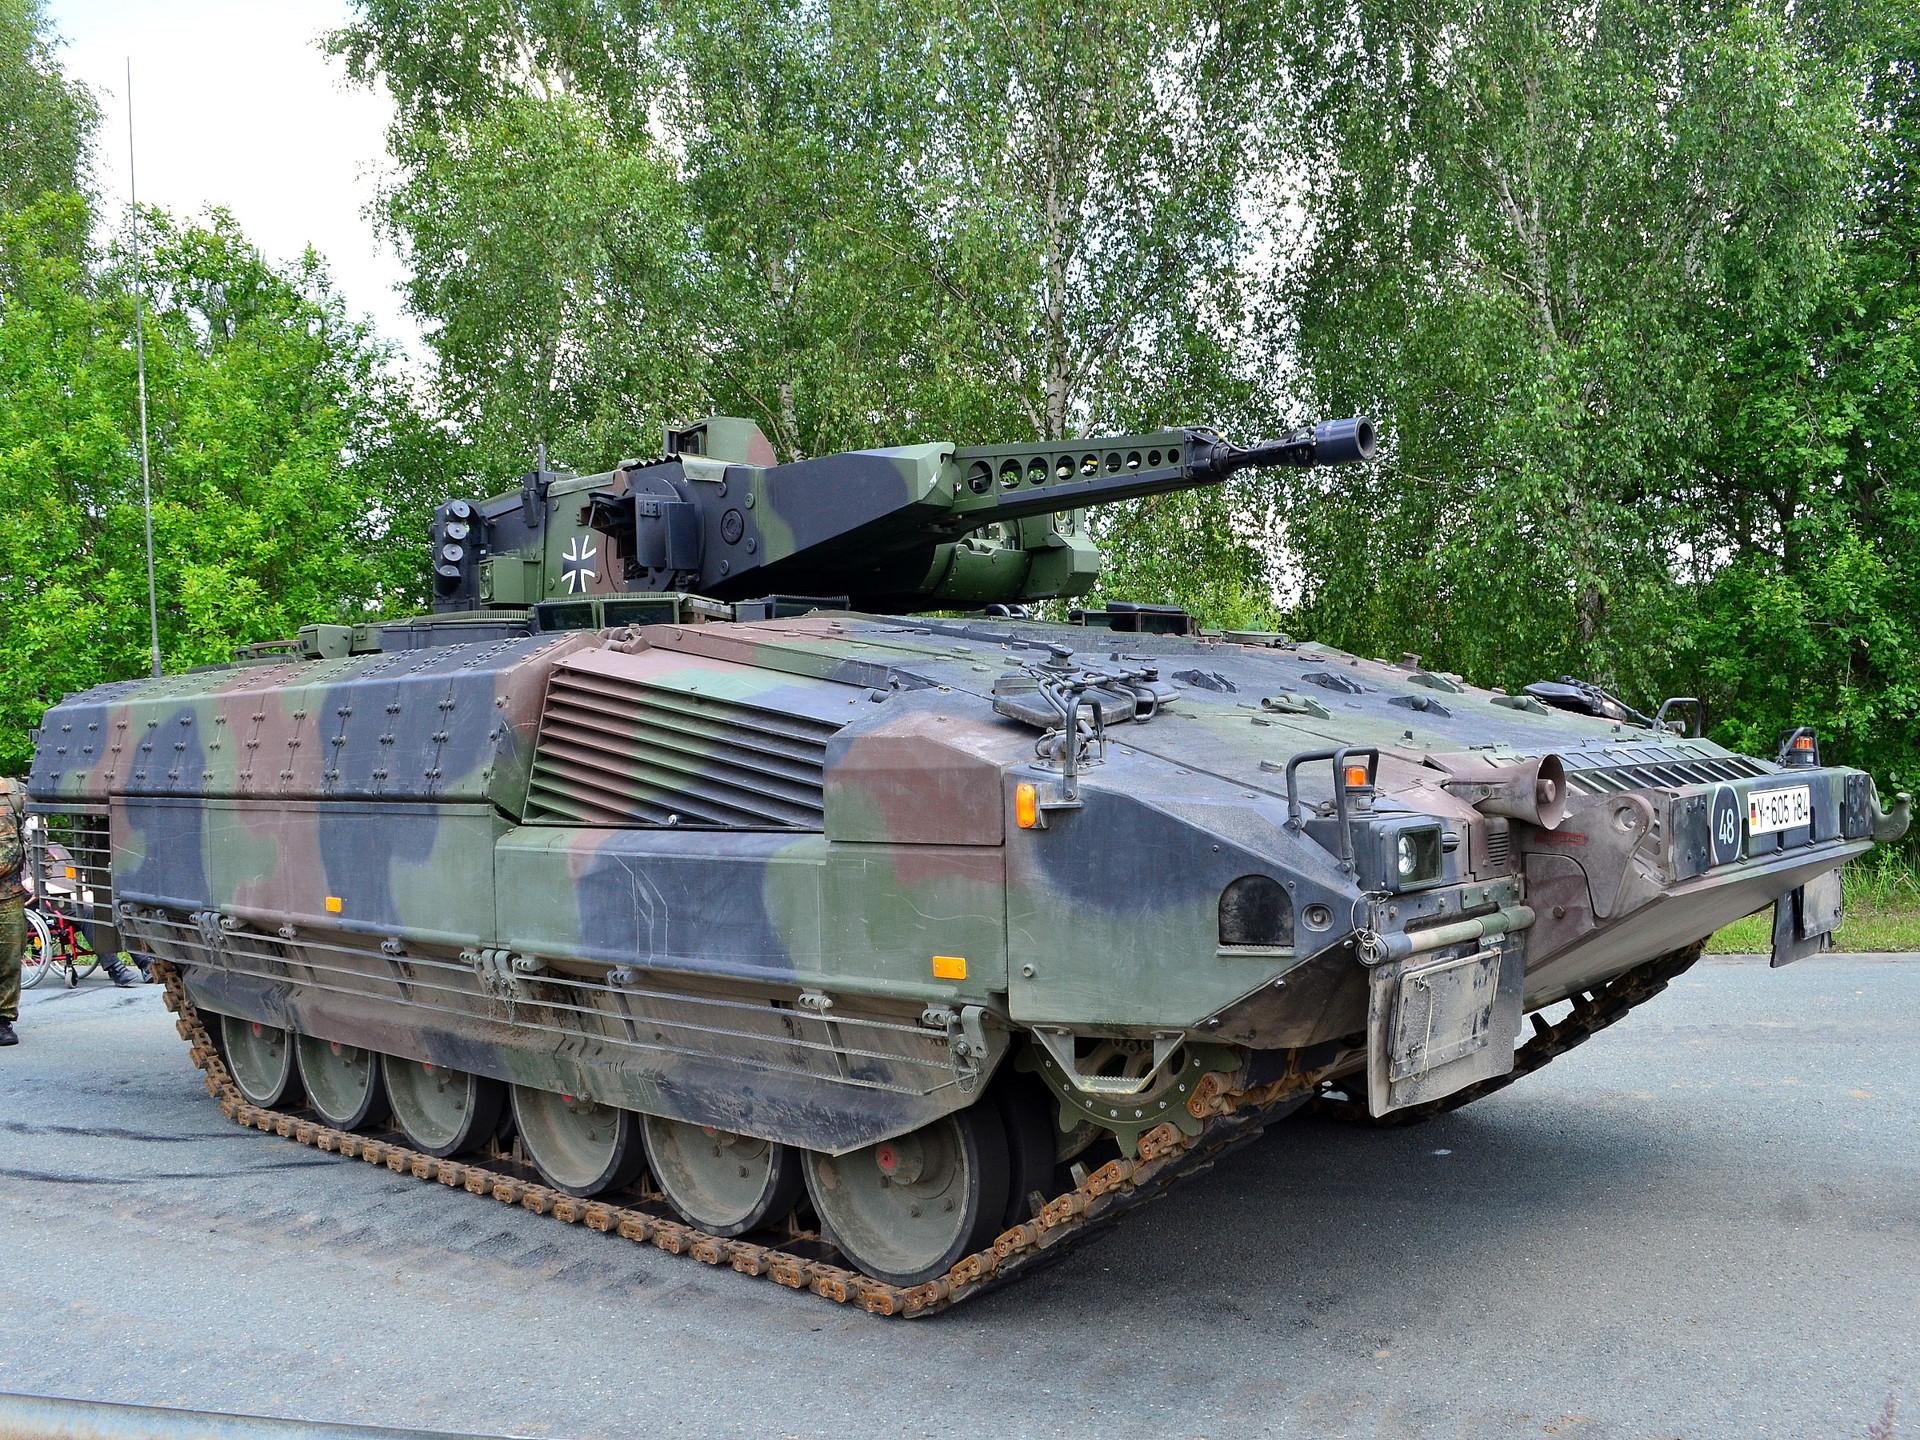 Немачки Schützenpanzer Puma компаније Krauss-Maffei Wegmann